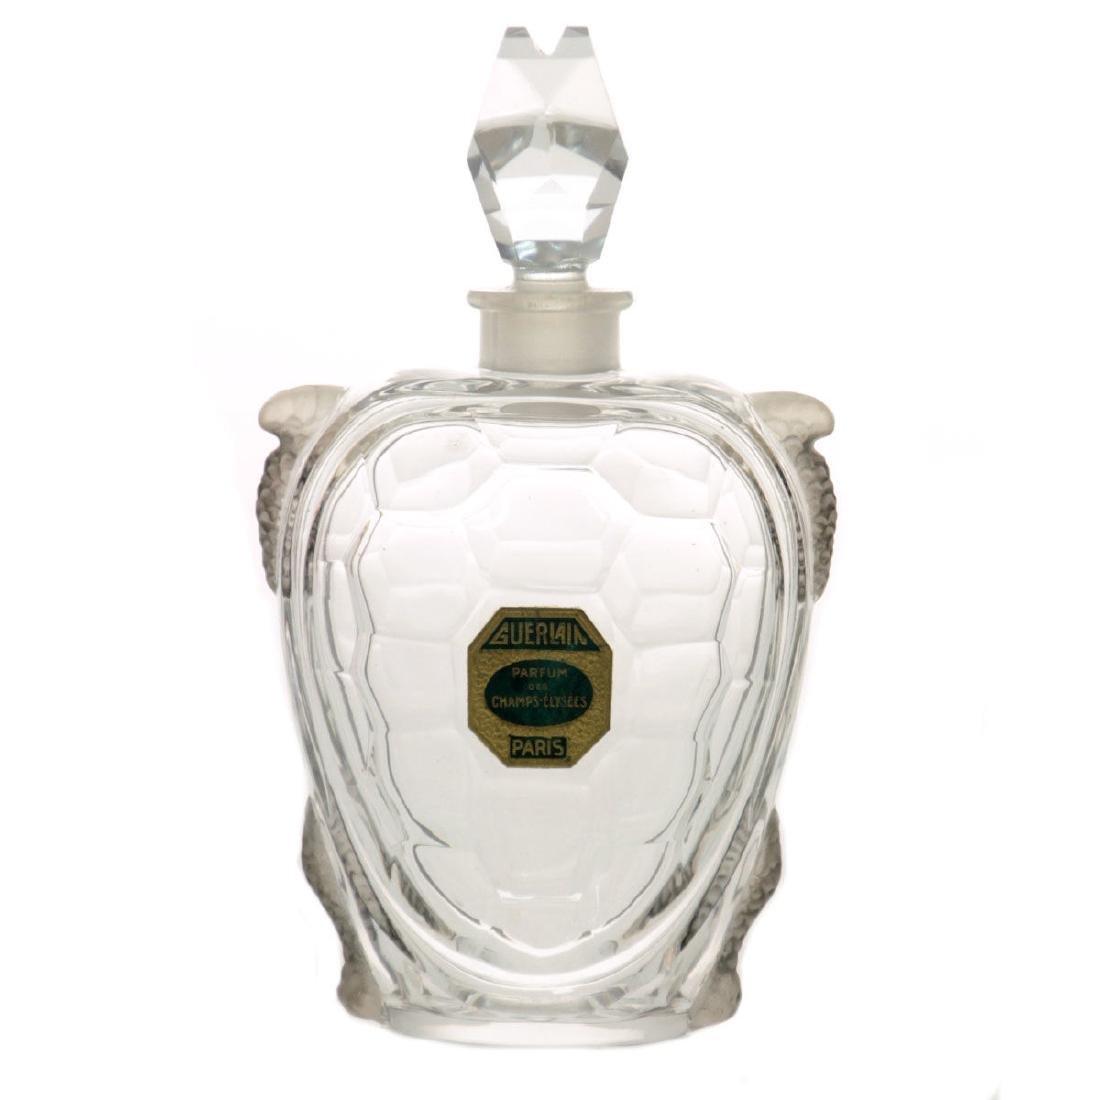 Baccarat for Guerlain Turtle Figure Perfume Bottle,